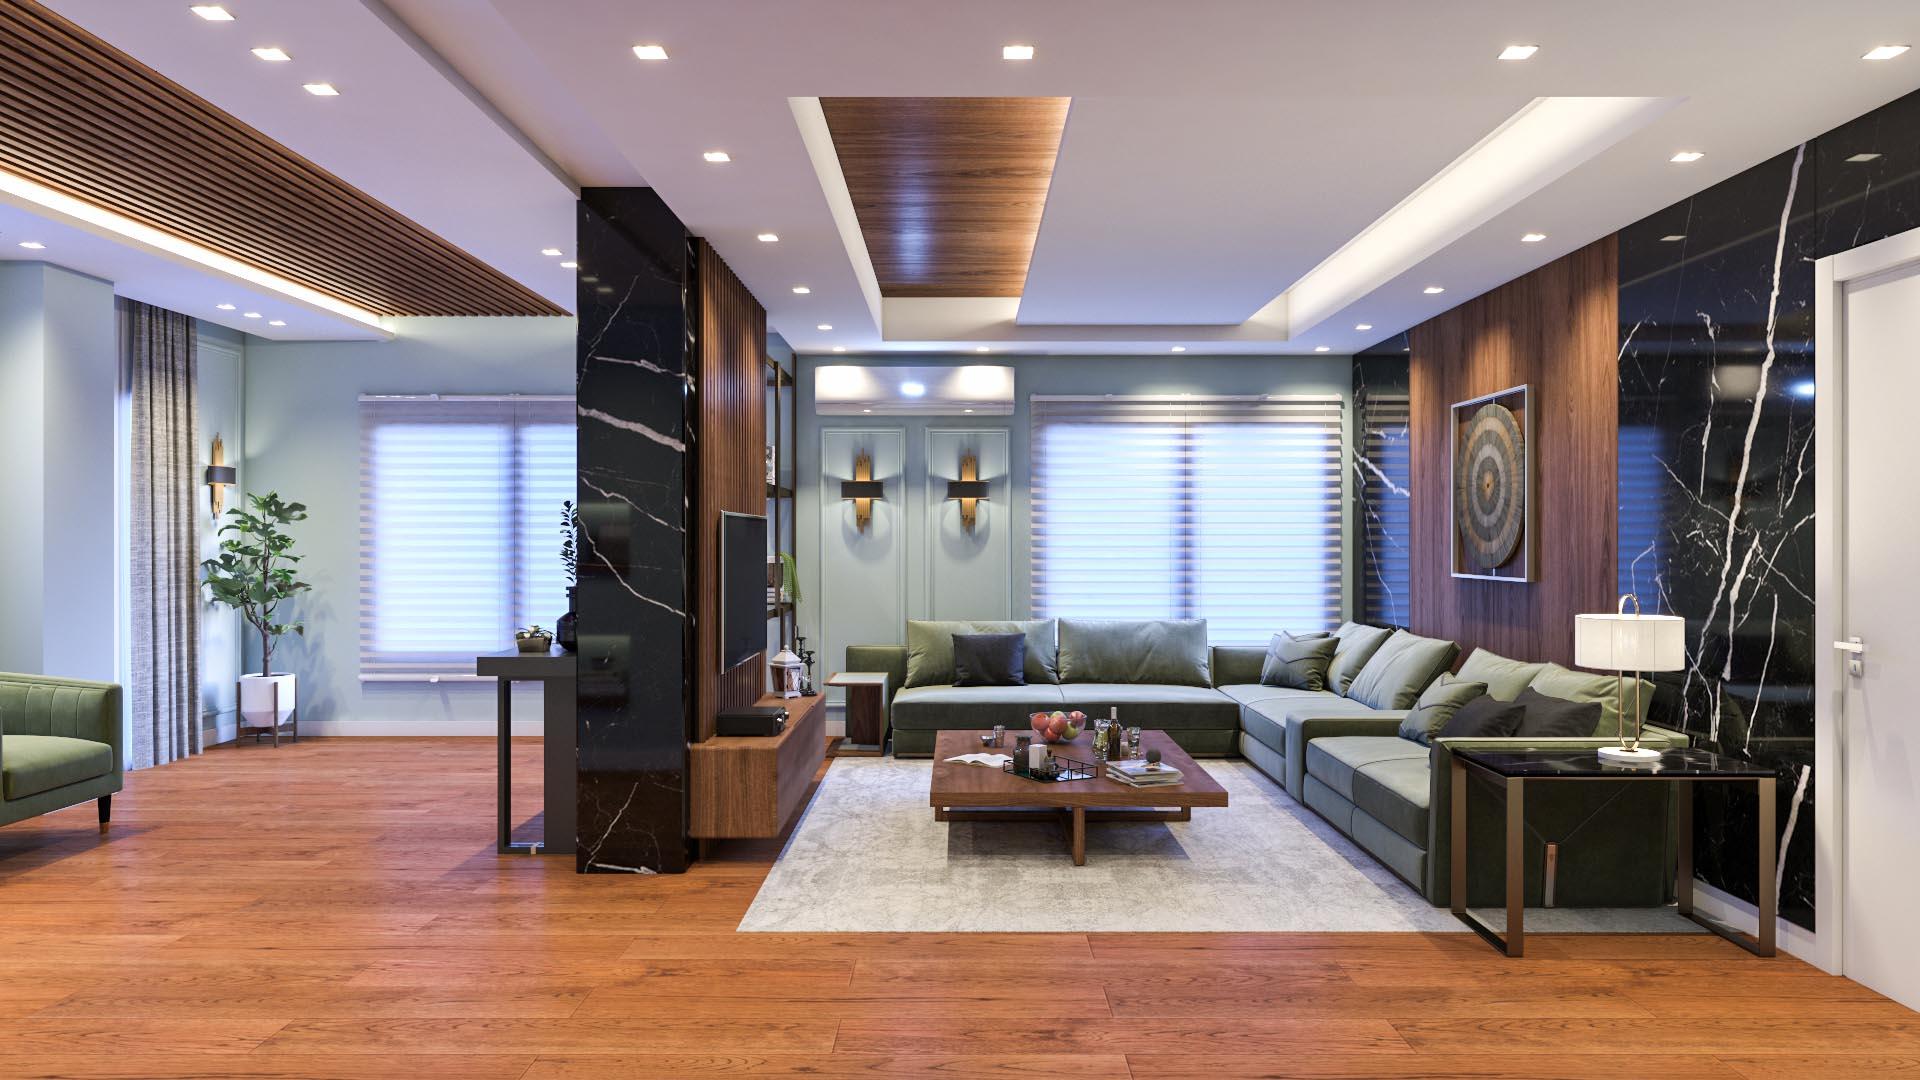 001-Living Room 001-2